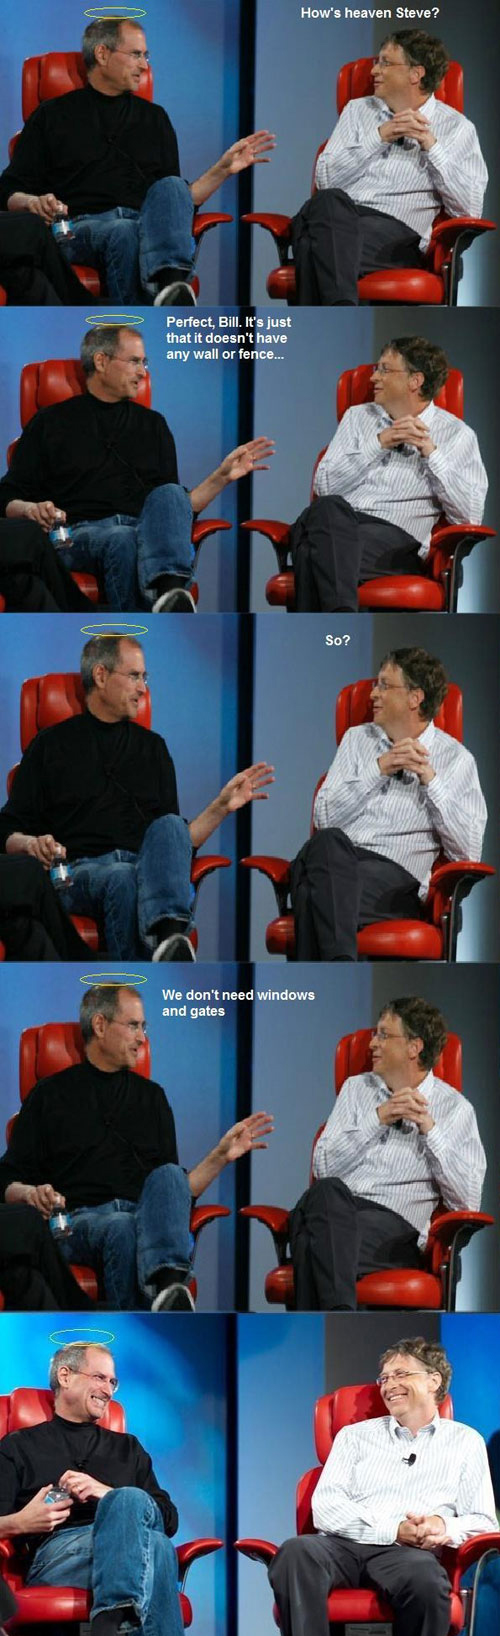 Steve&Bill